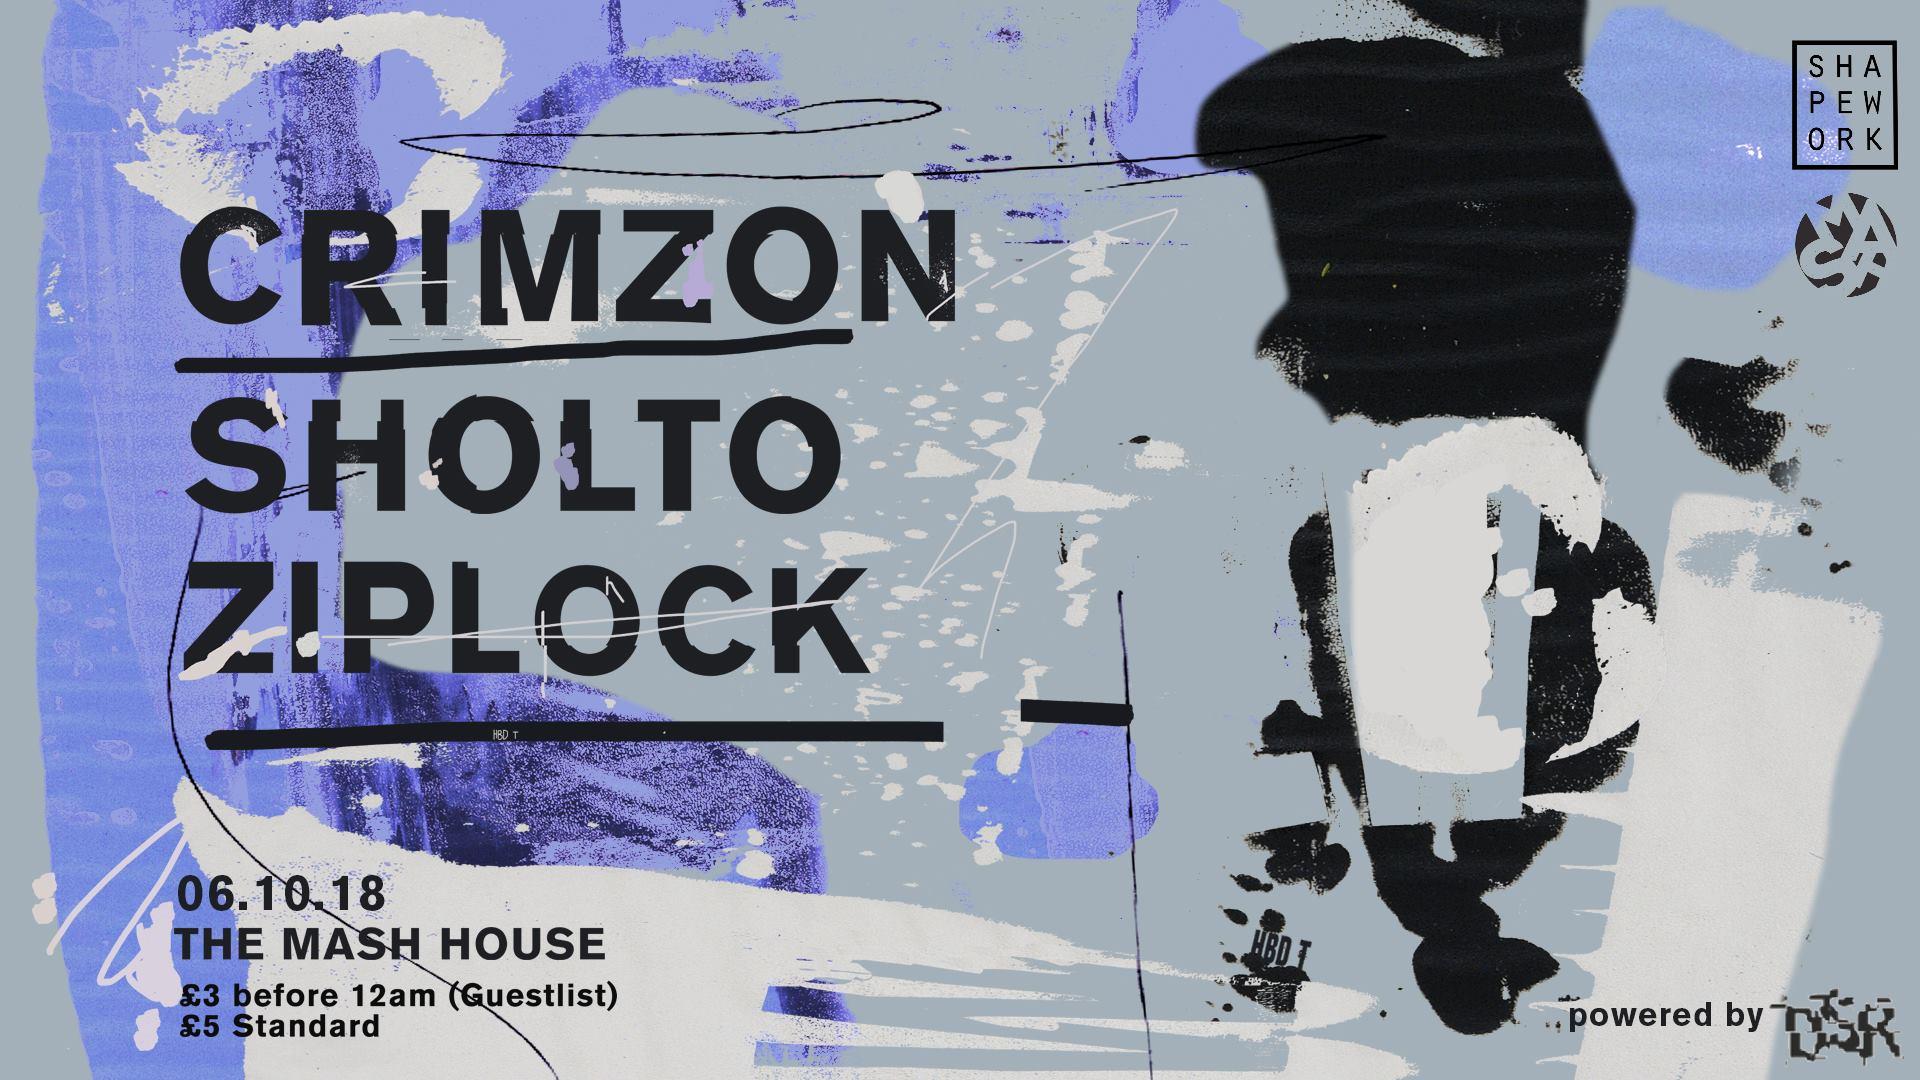 Shapework / Crimzon, Sholto & Ziplock